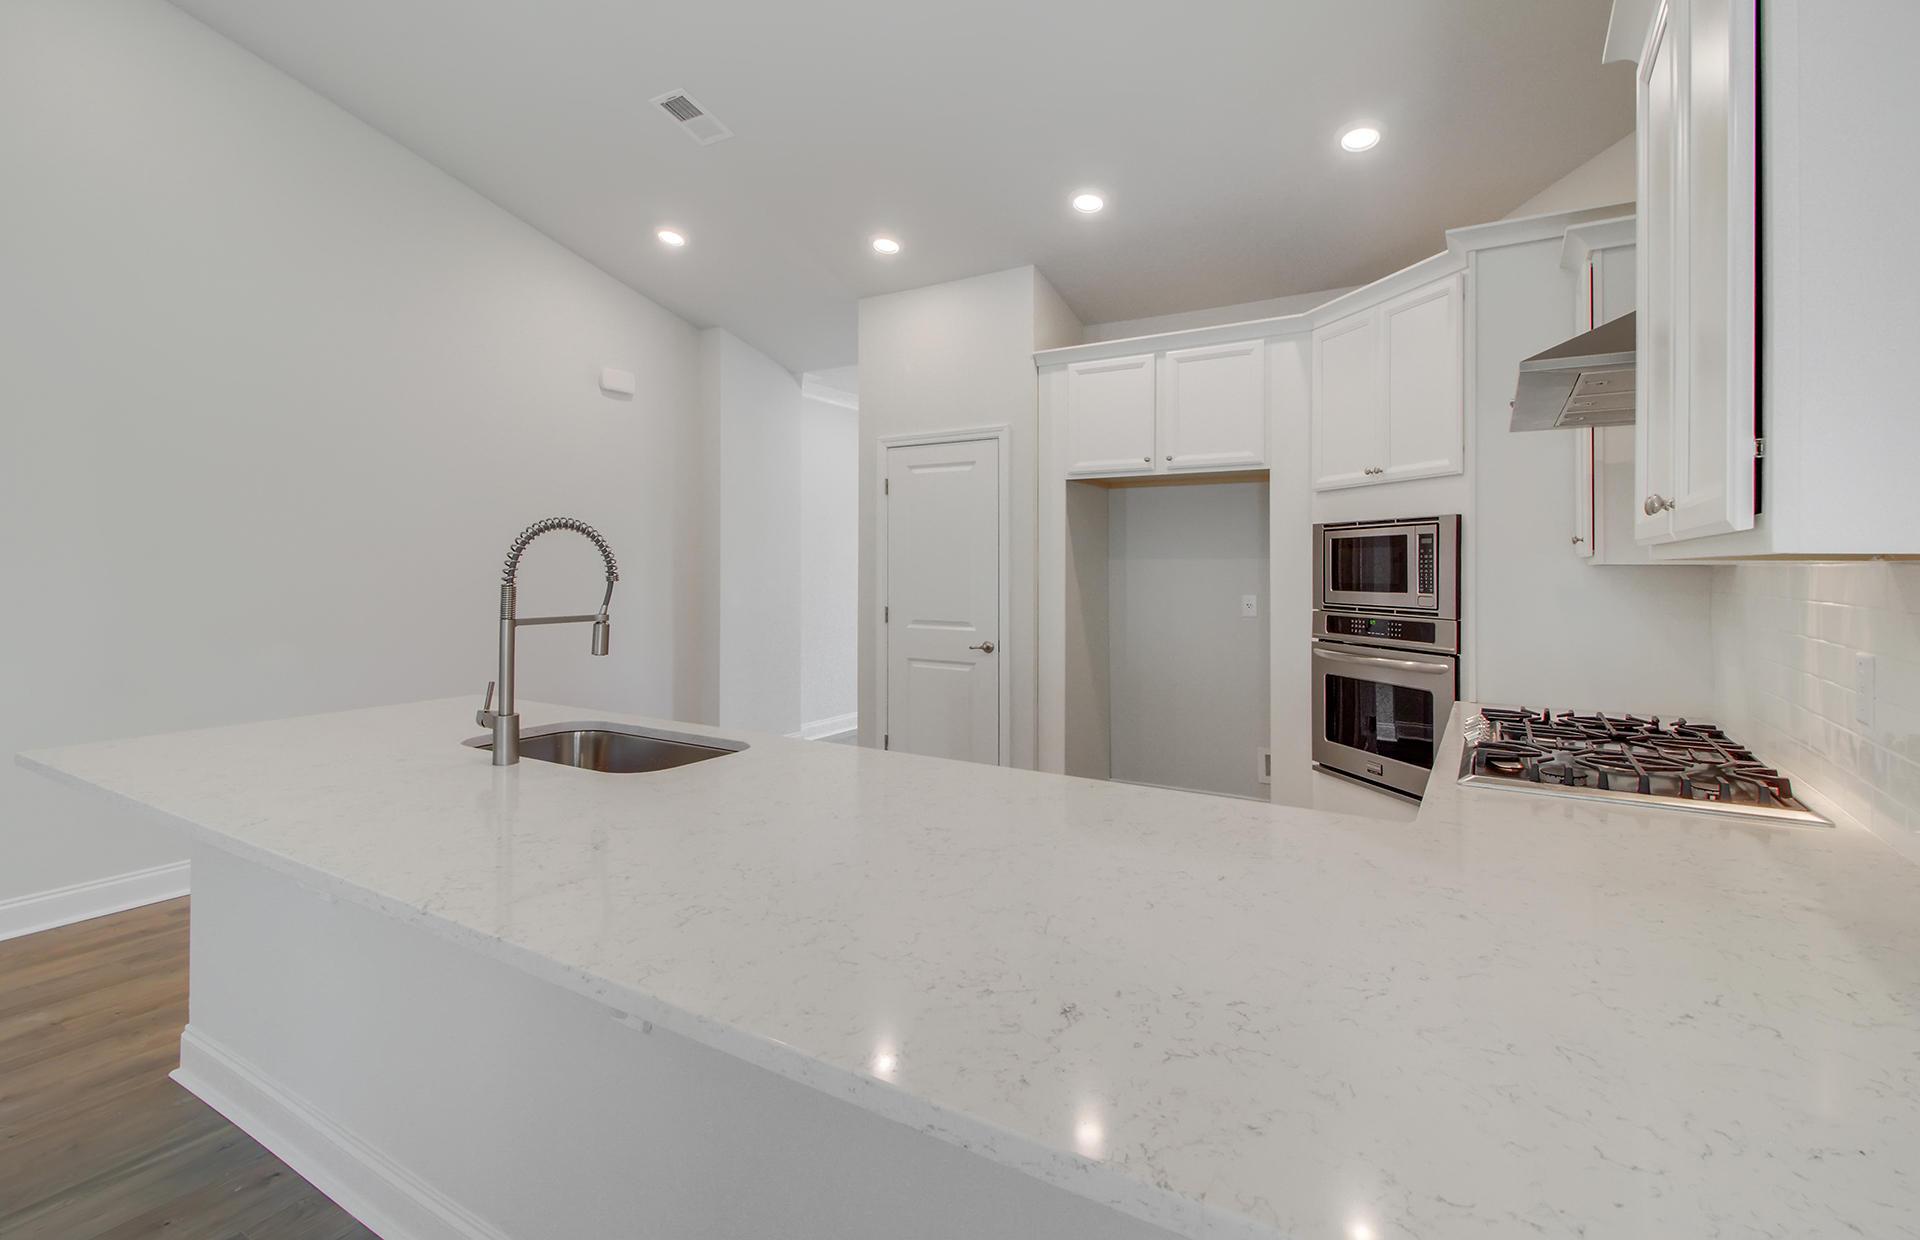 Park West Homes For Sale - 3062 Rice Field, Mount Pleasant, SC - 6